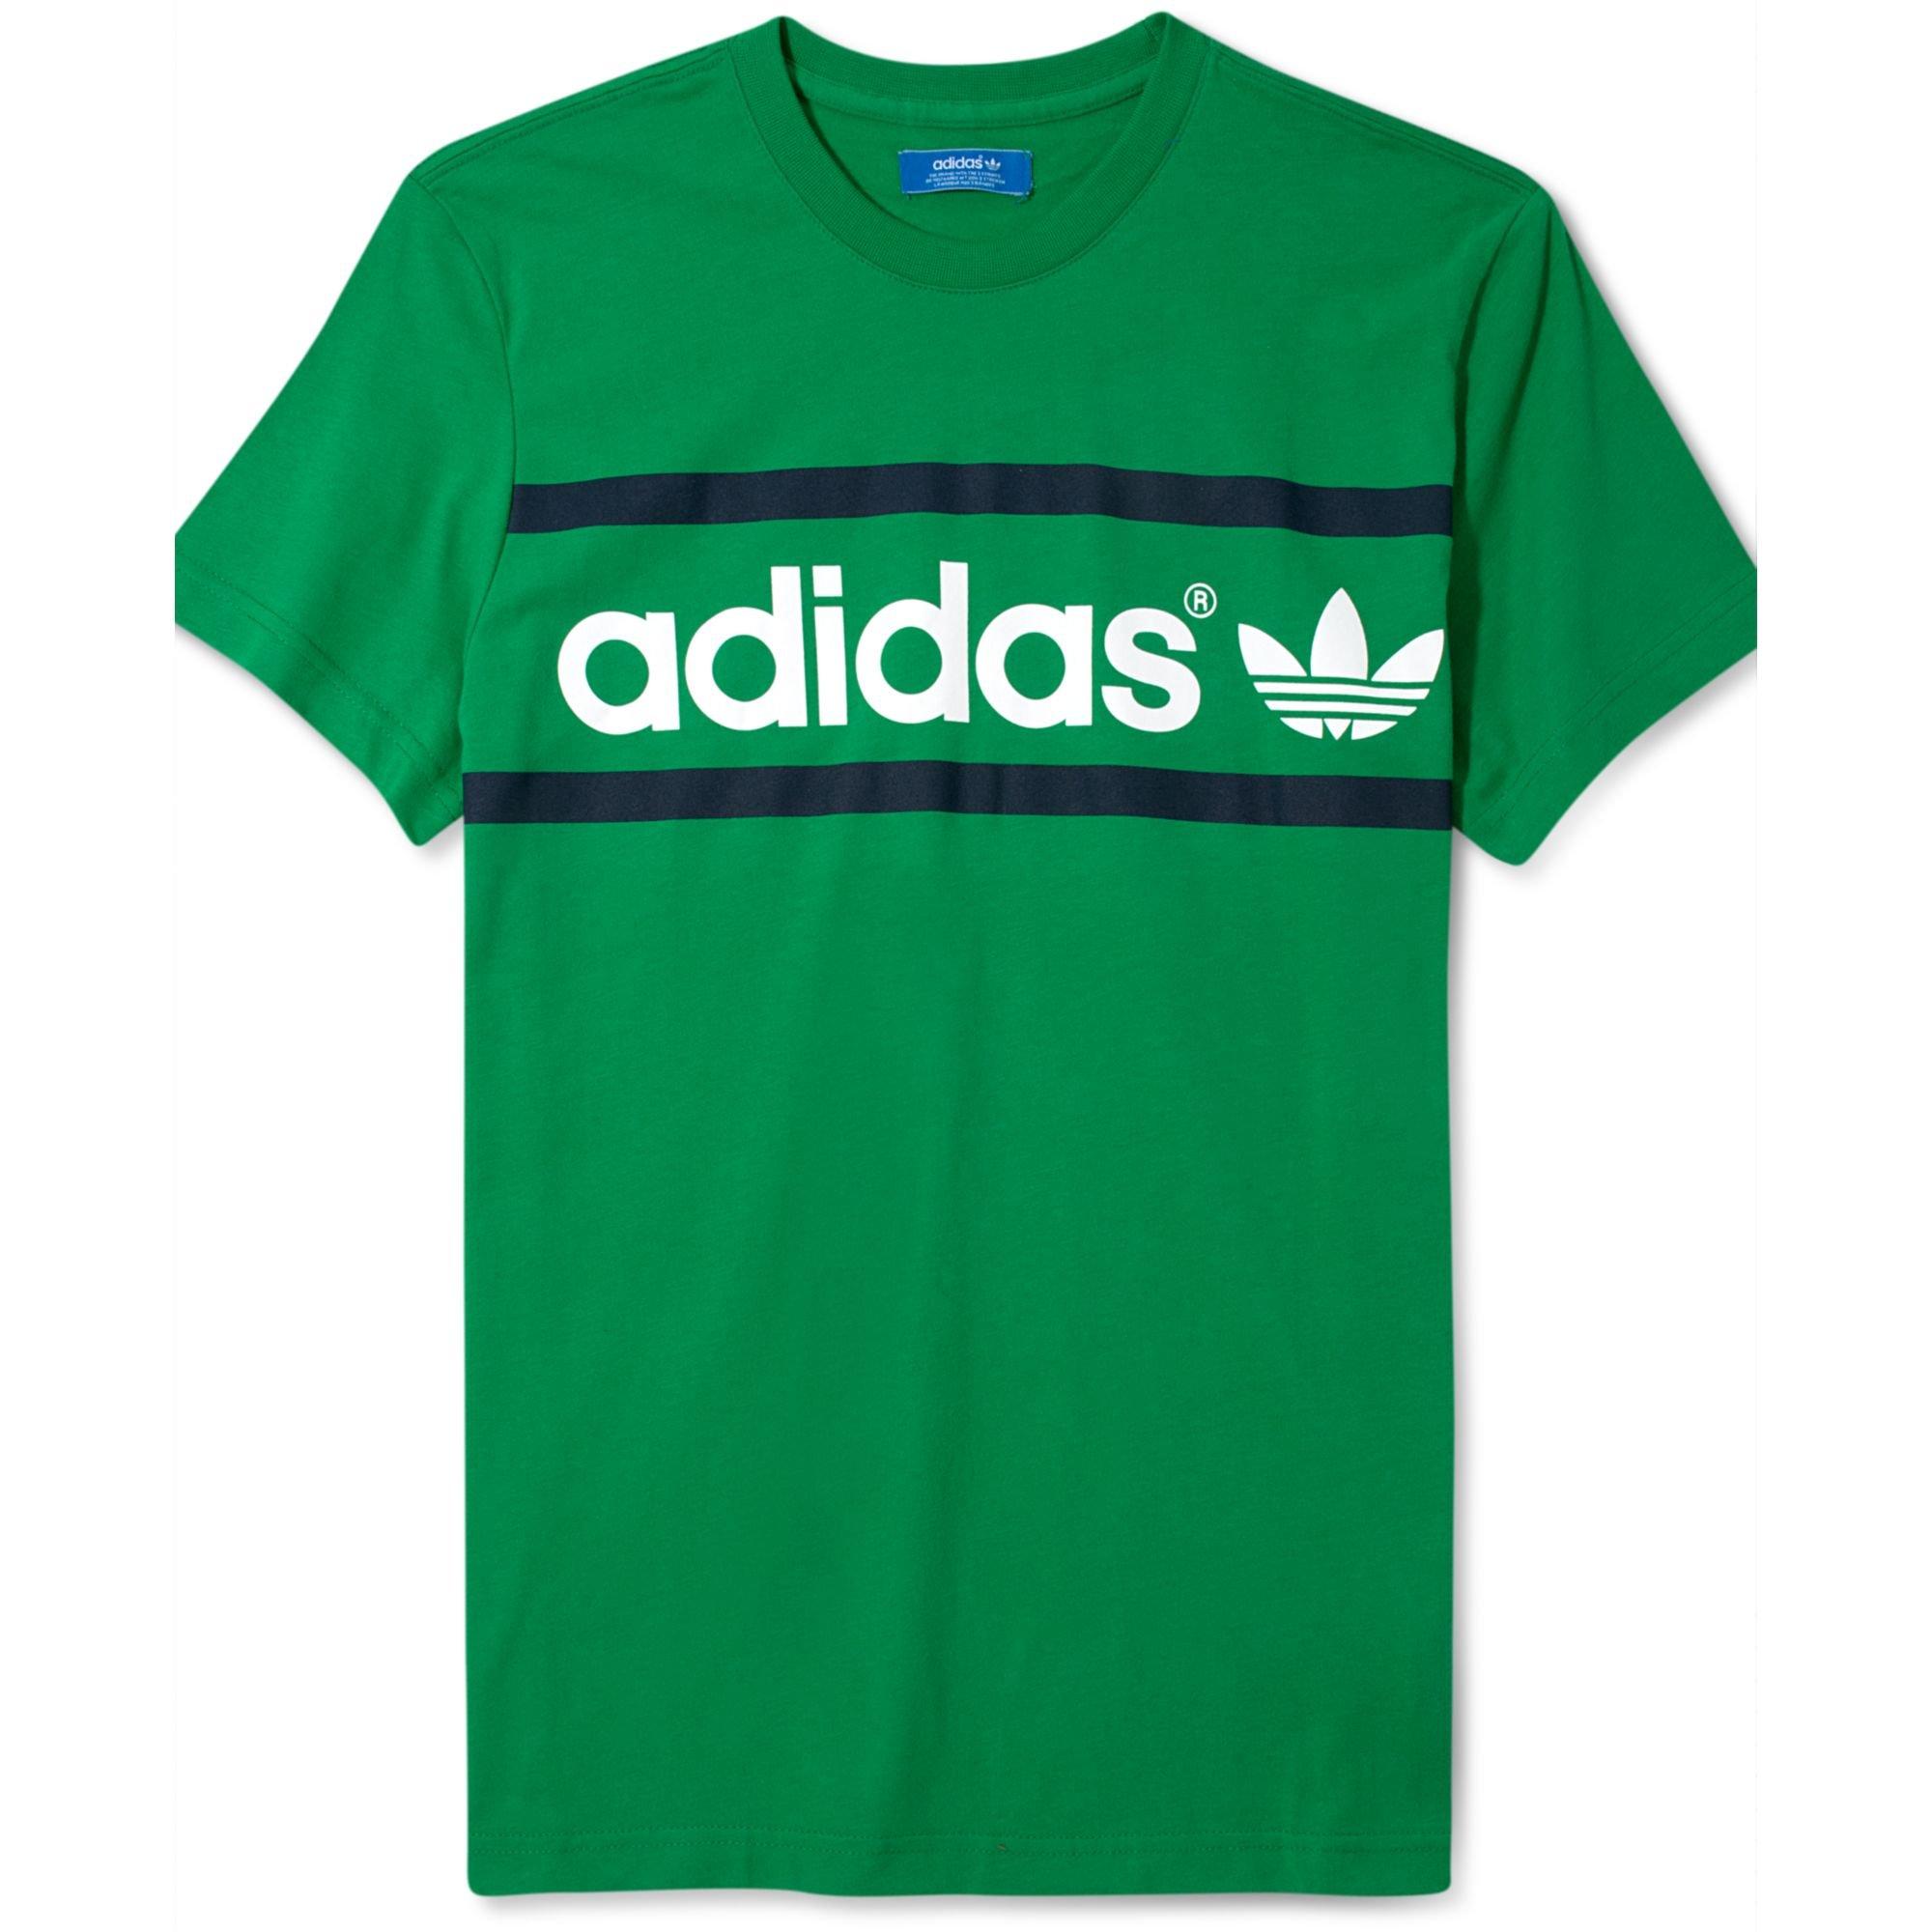 826d156c3a4 Lyst - Adidas Originals Heritage Logo T Shirt in Green for Men